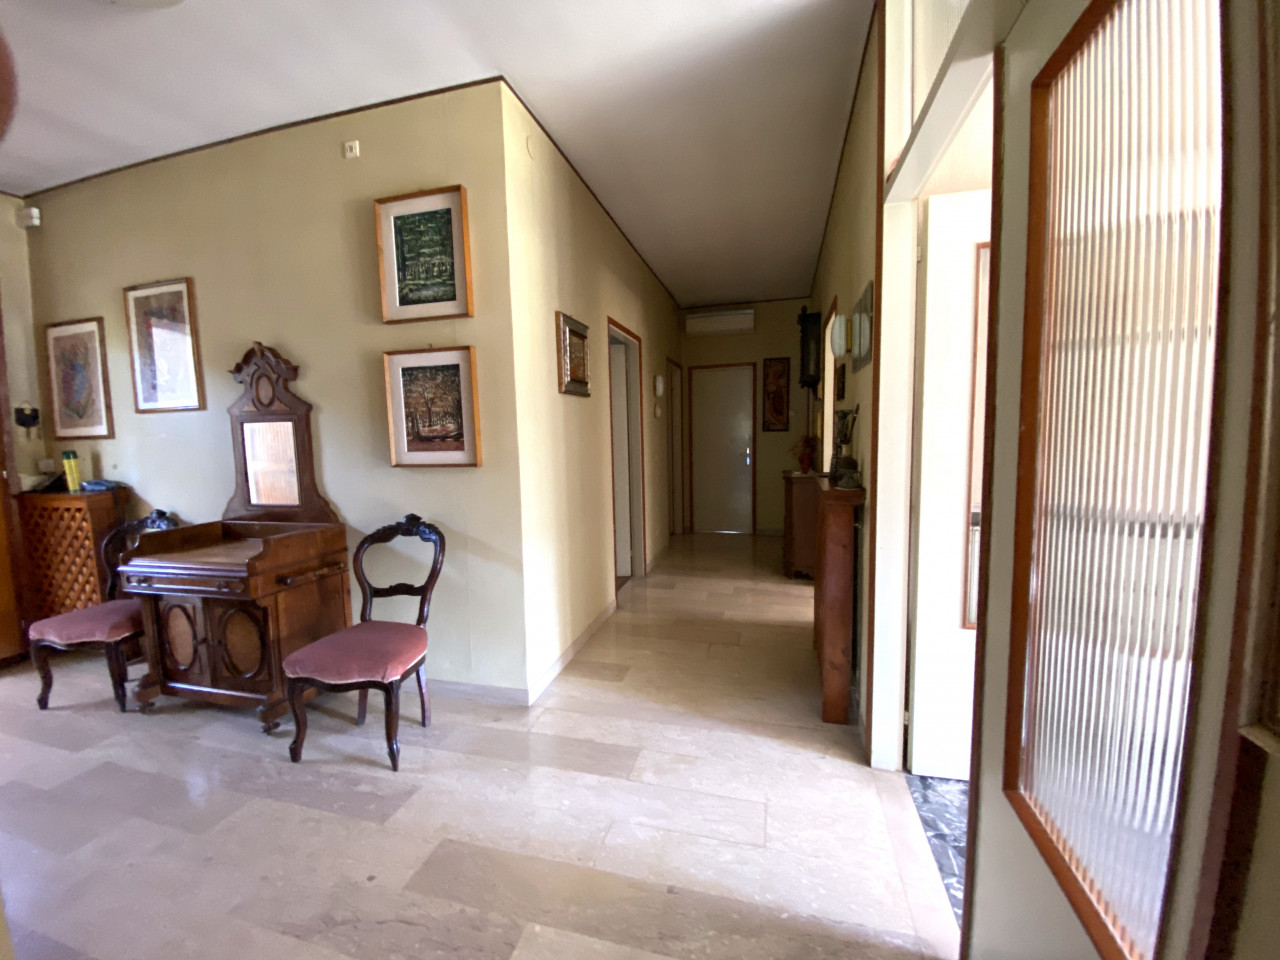 Casa singola con capannone in vendita in centro a Budoia - Rif. V.D.1 https://images.gestionaleimmobiliare.it/foto/annunci/200702/2265893/1280x1280/002__img_2980.jpg